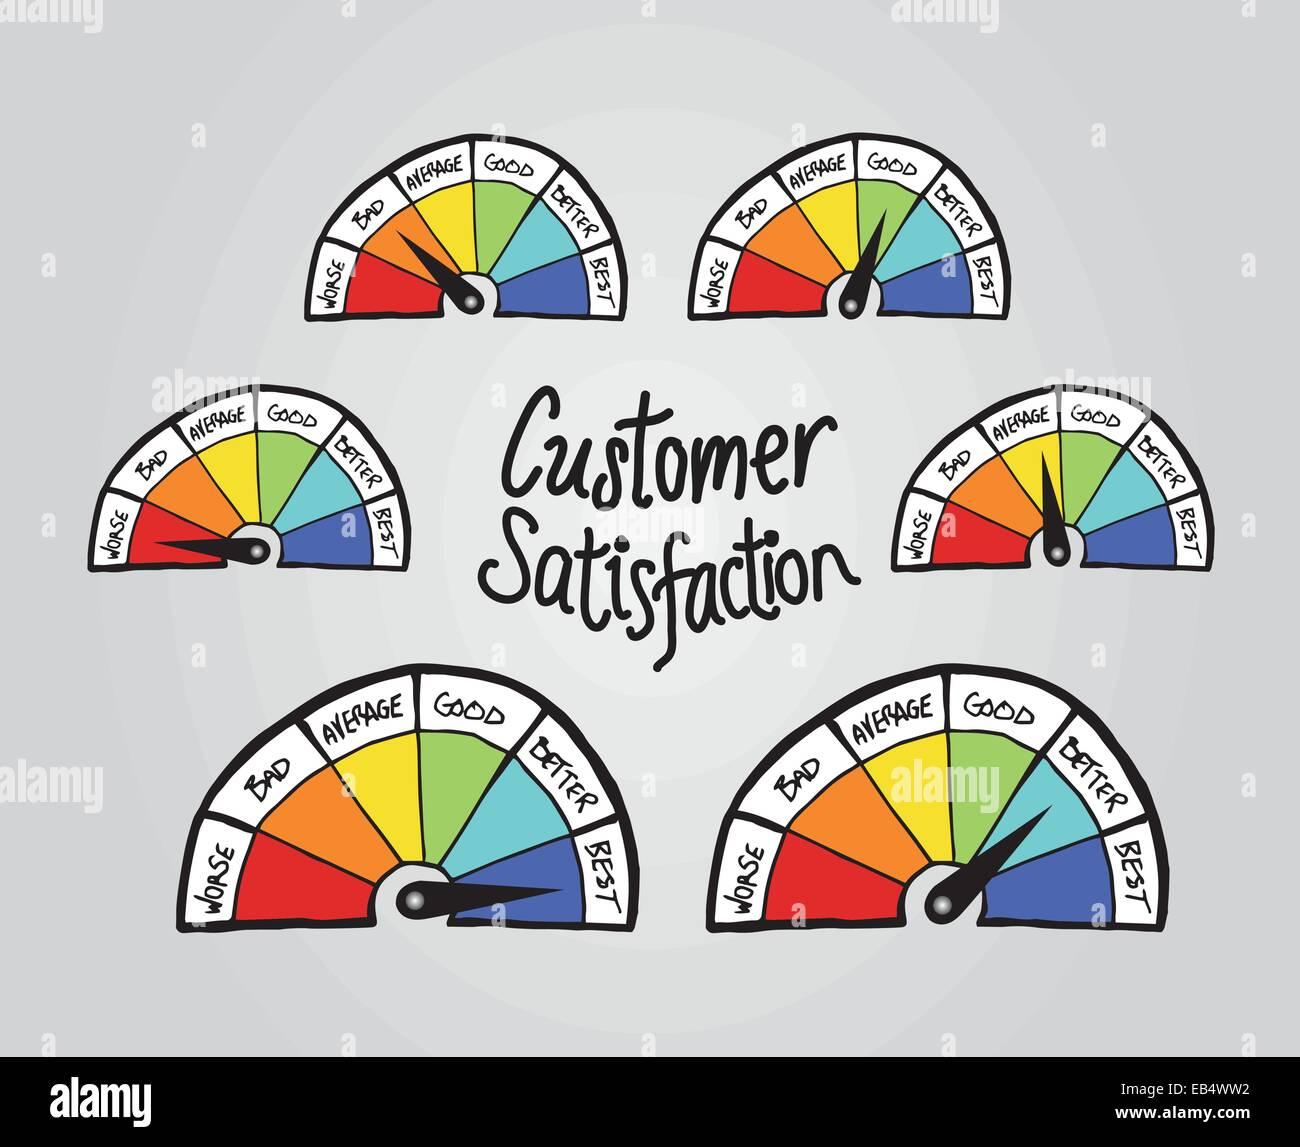 Customer satisfaction illustrations - Stock Vector